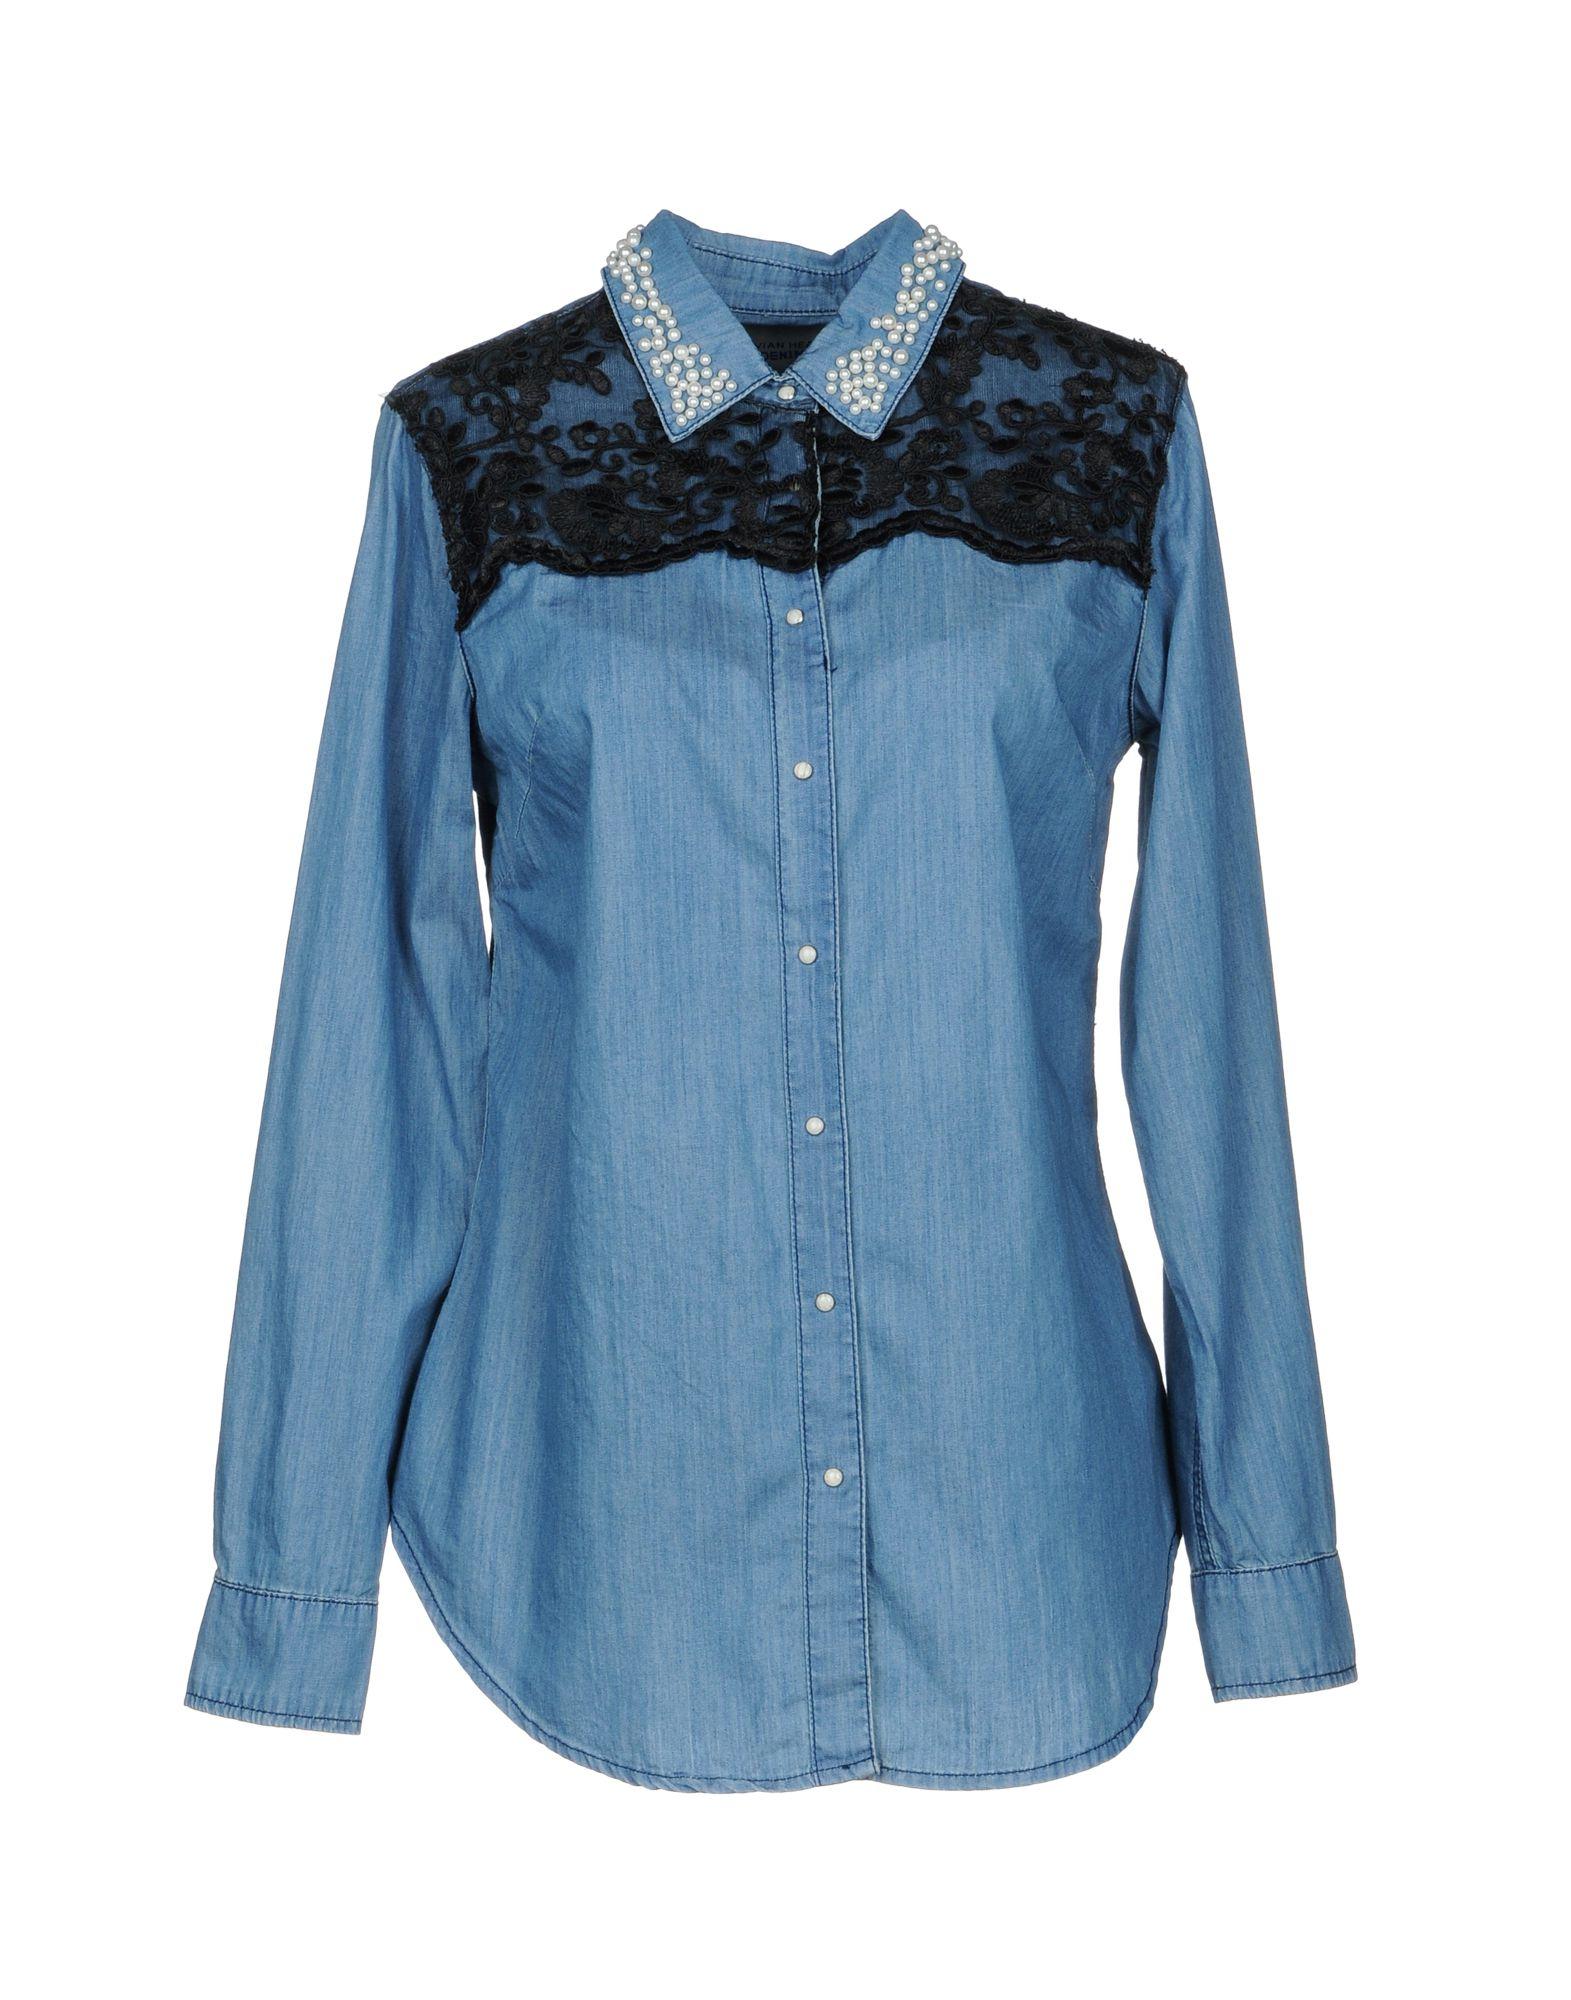 SILVIAN HEACH Джинсовая рубашка рубашка silvian heach kids рубашка